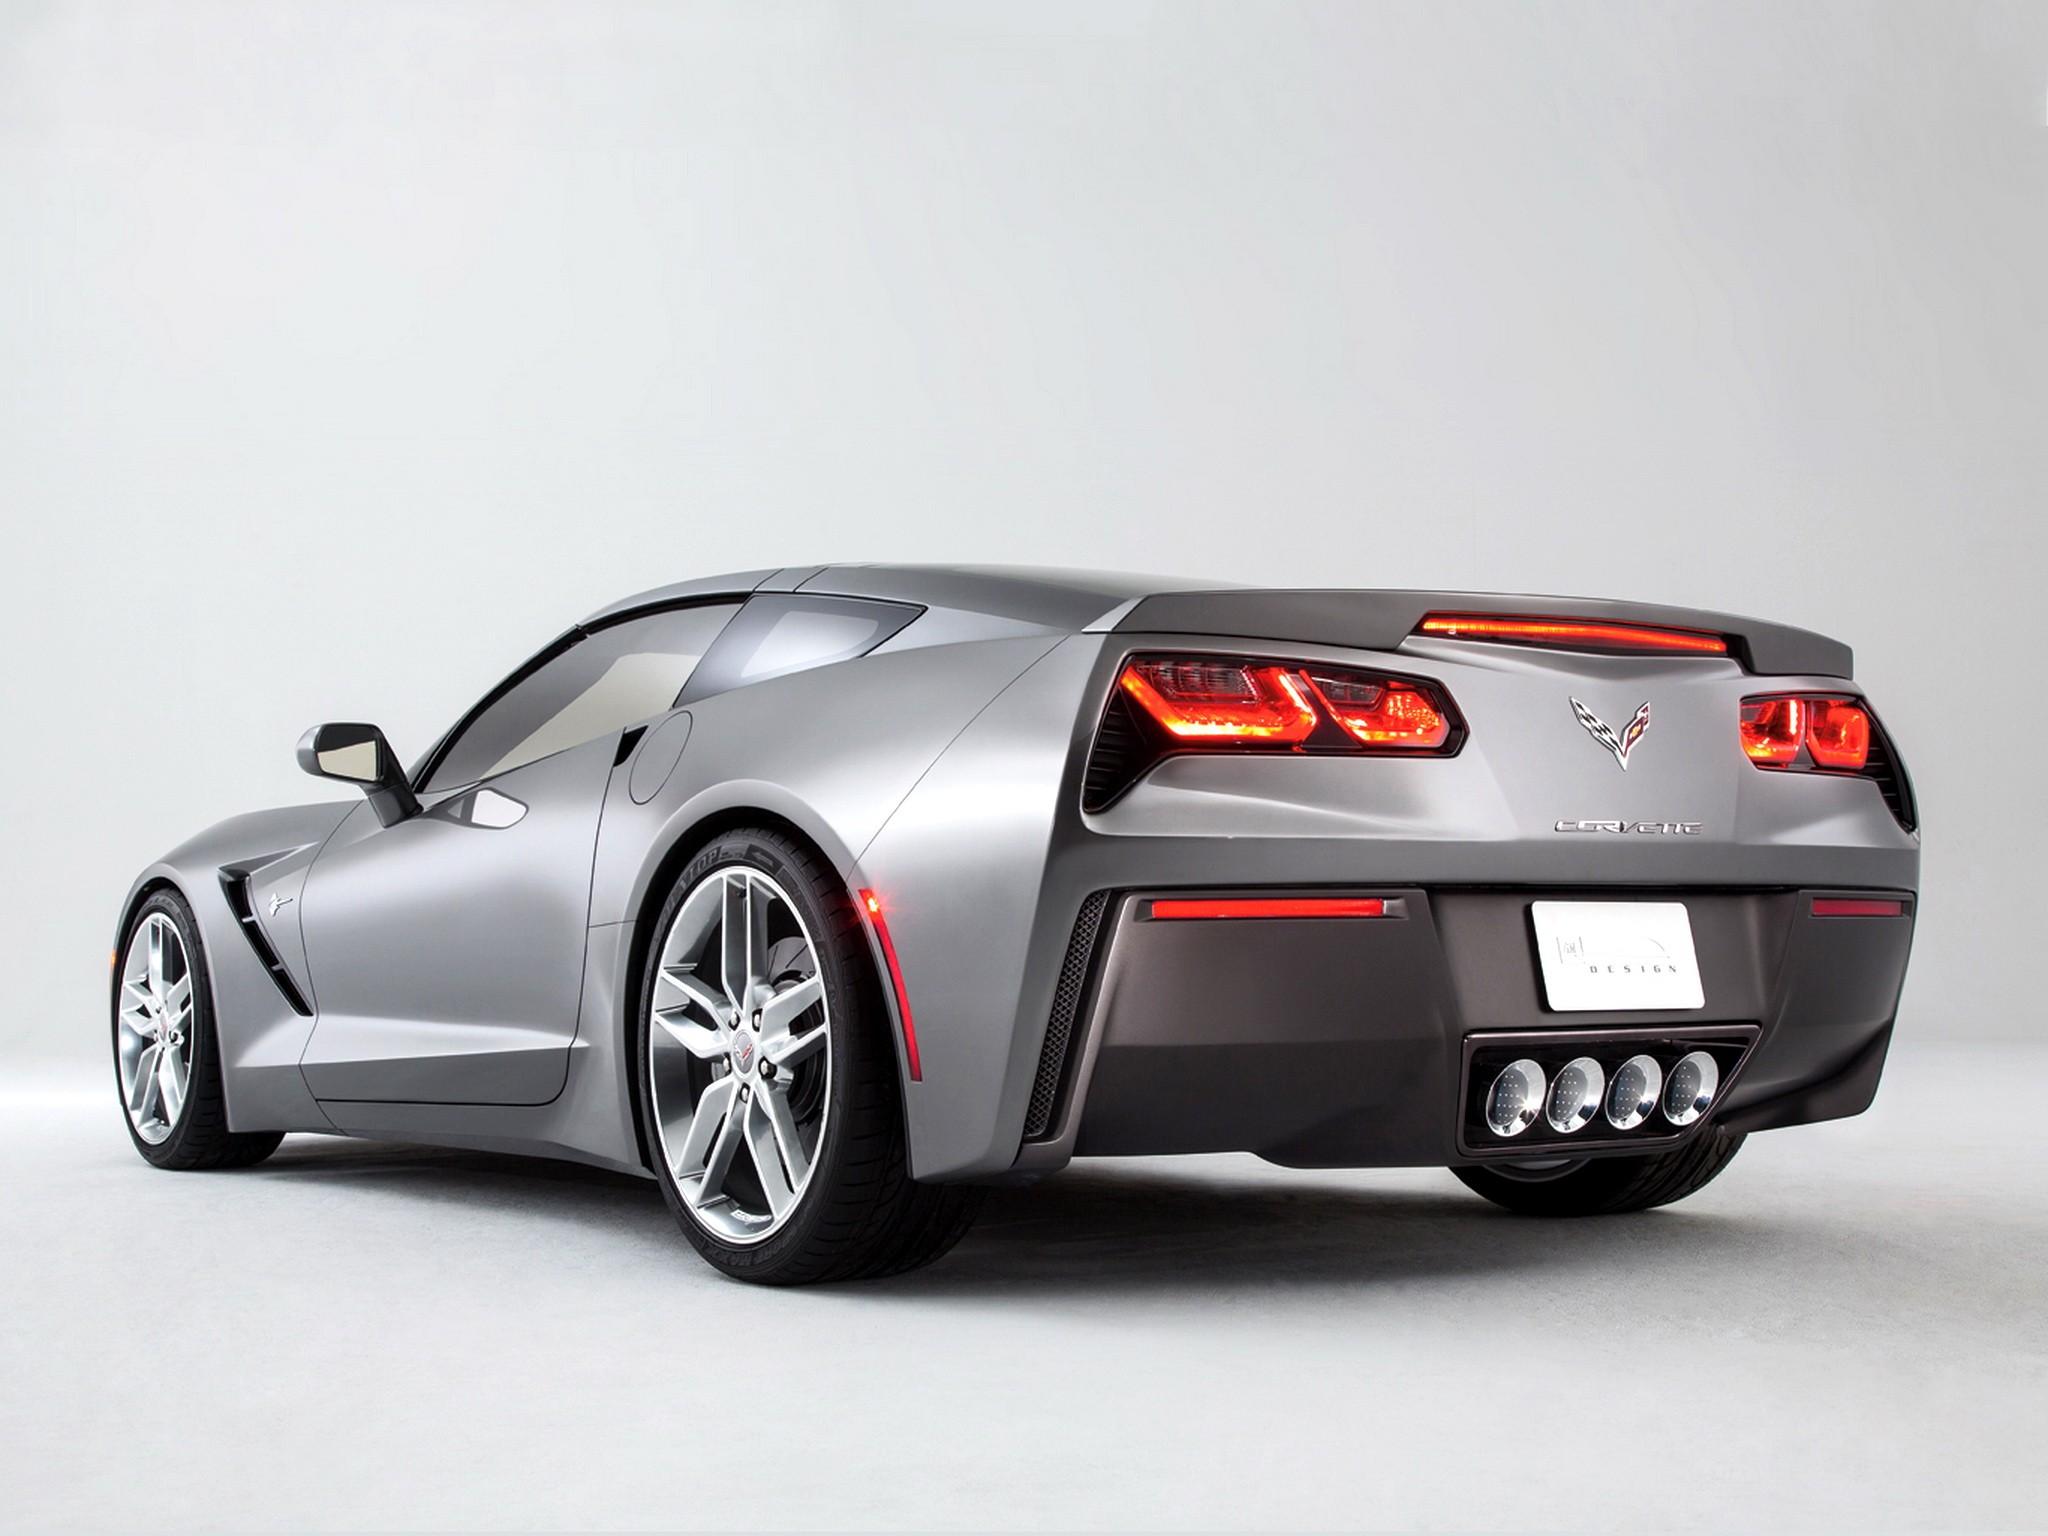 chevrolet corvette stingray c7 specs 2013 2014 2015. Black Bedroom Furniture Sets. Home Design Ideas